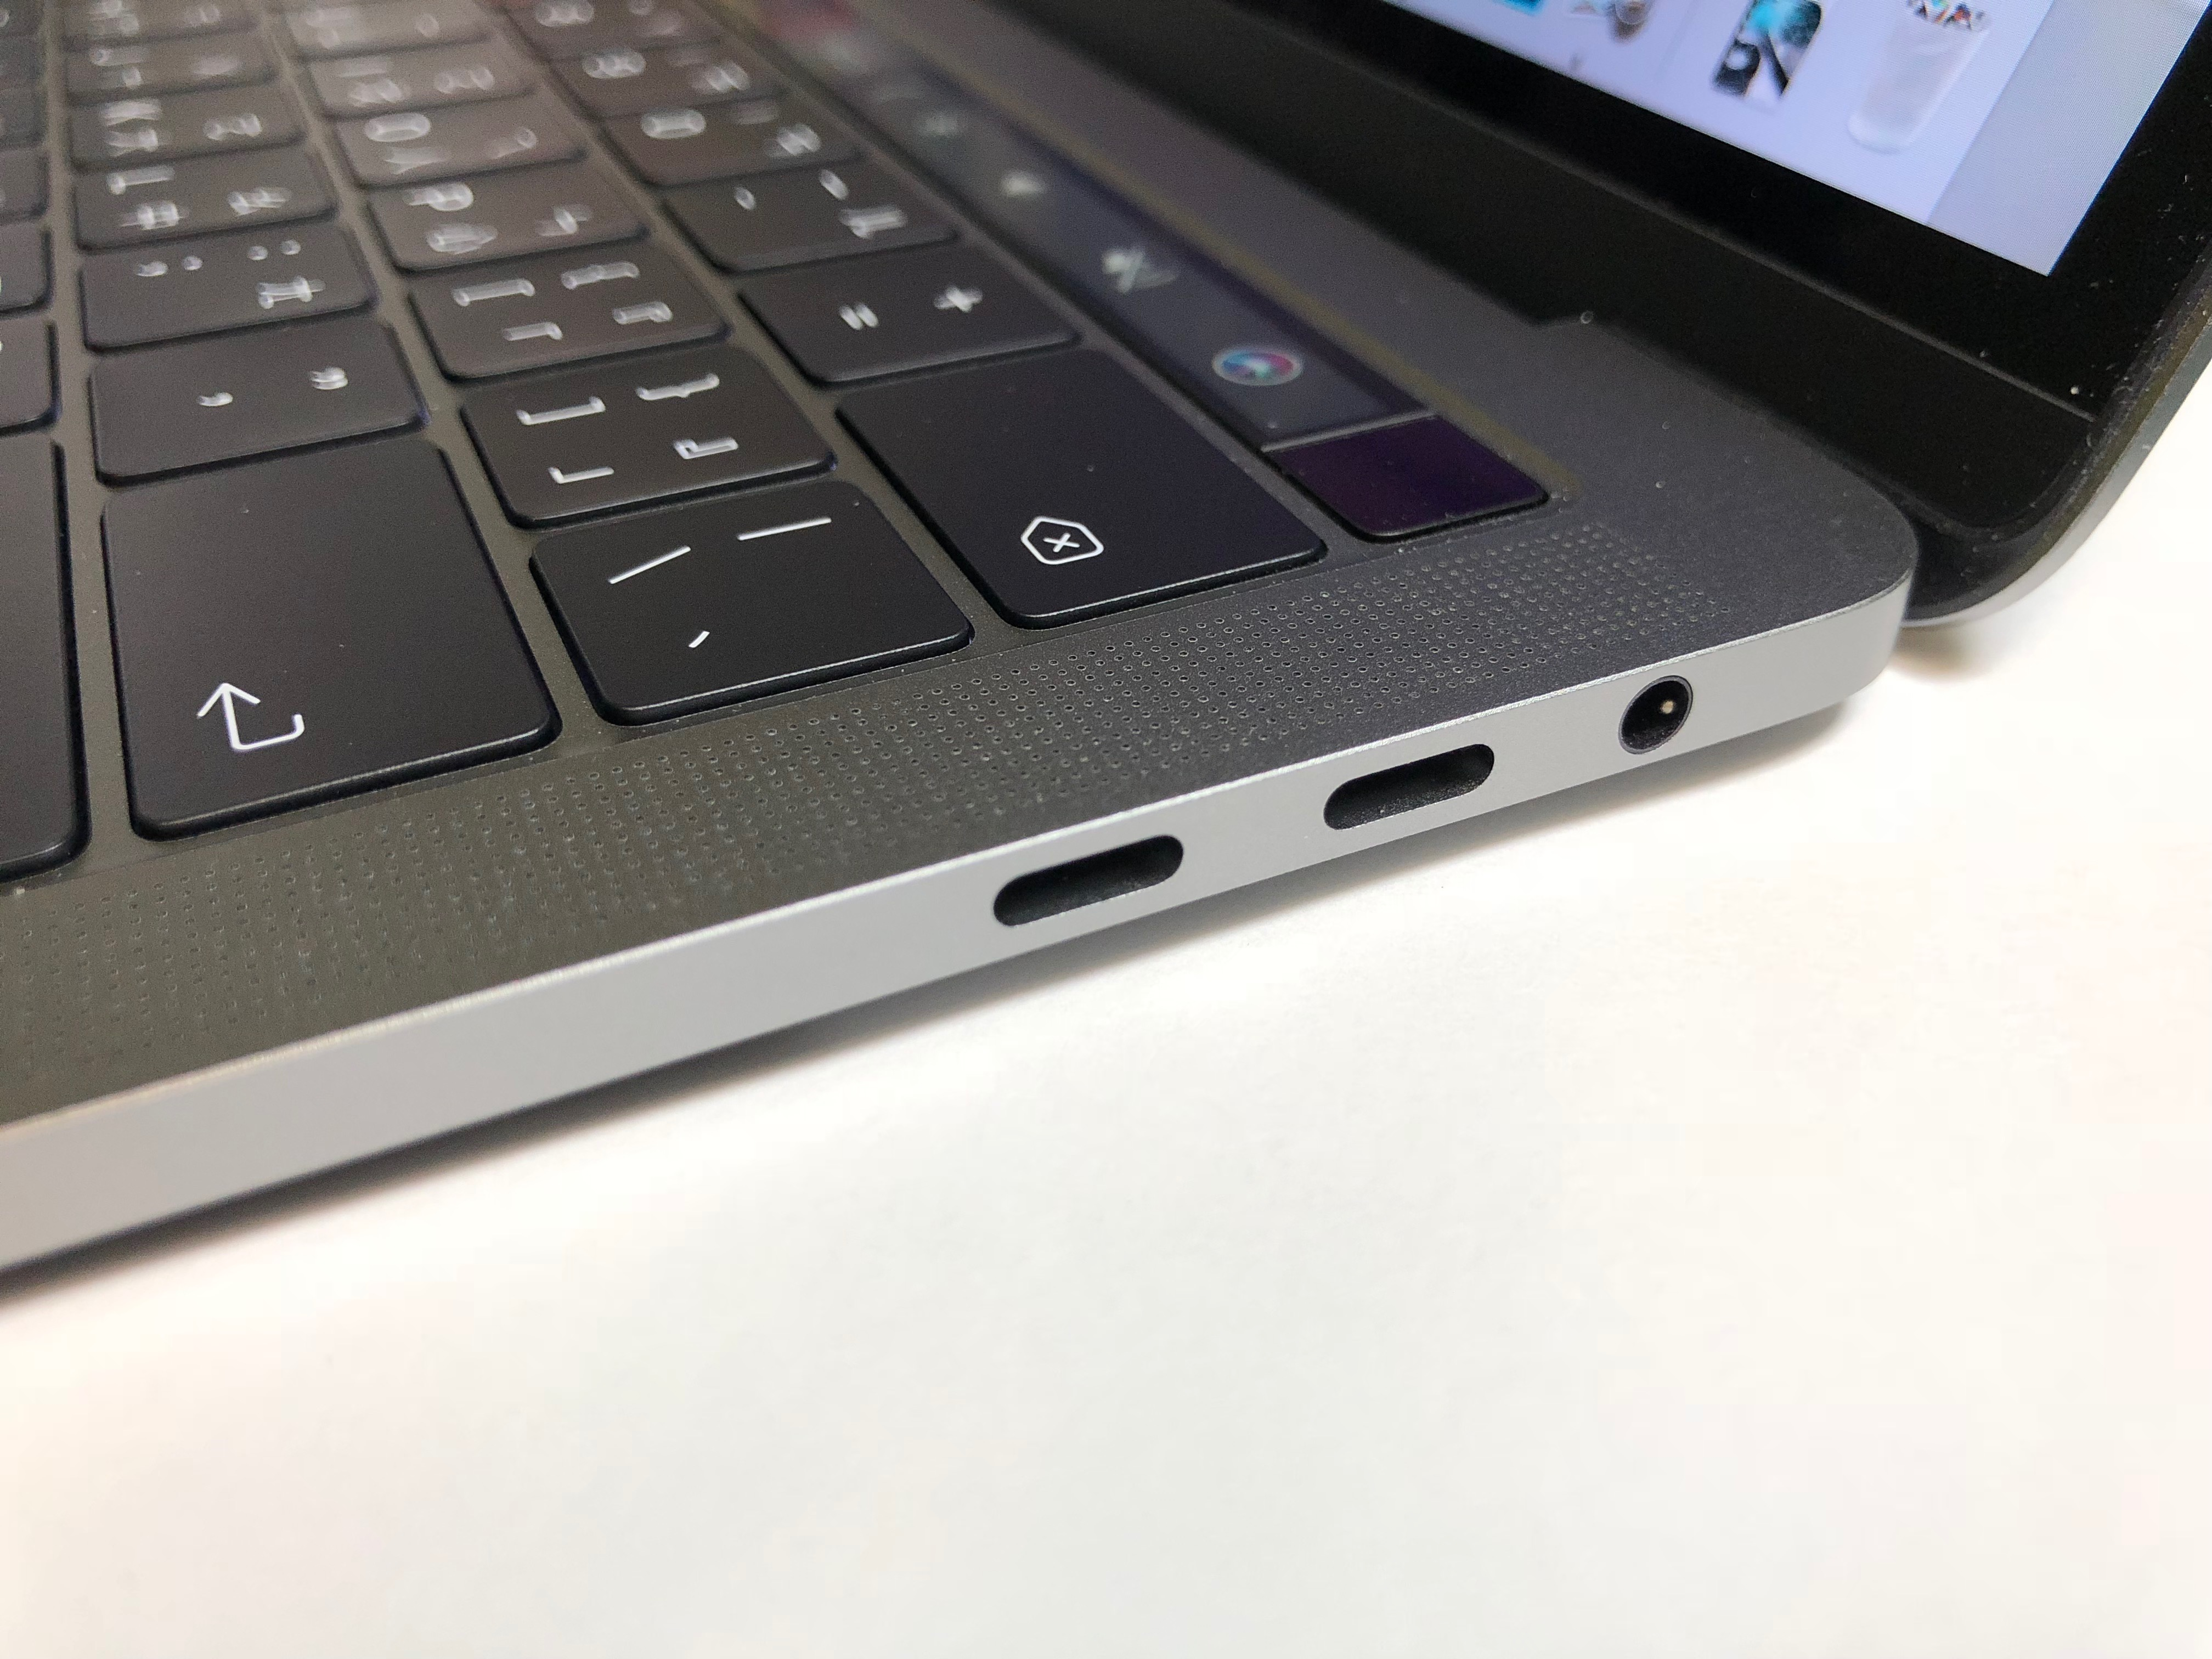 MacBook Pro 鍵盤故障送修過程-維修後鍵盤上機殼